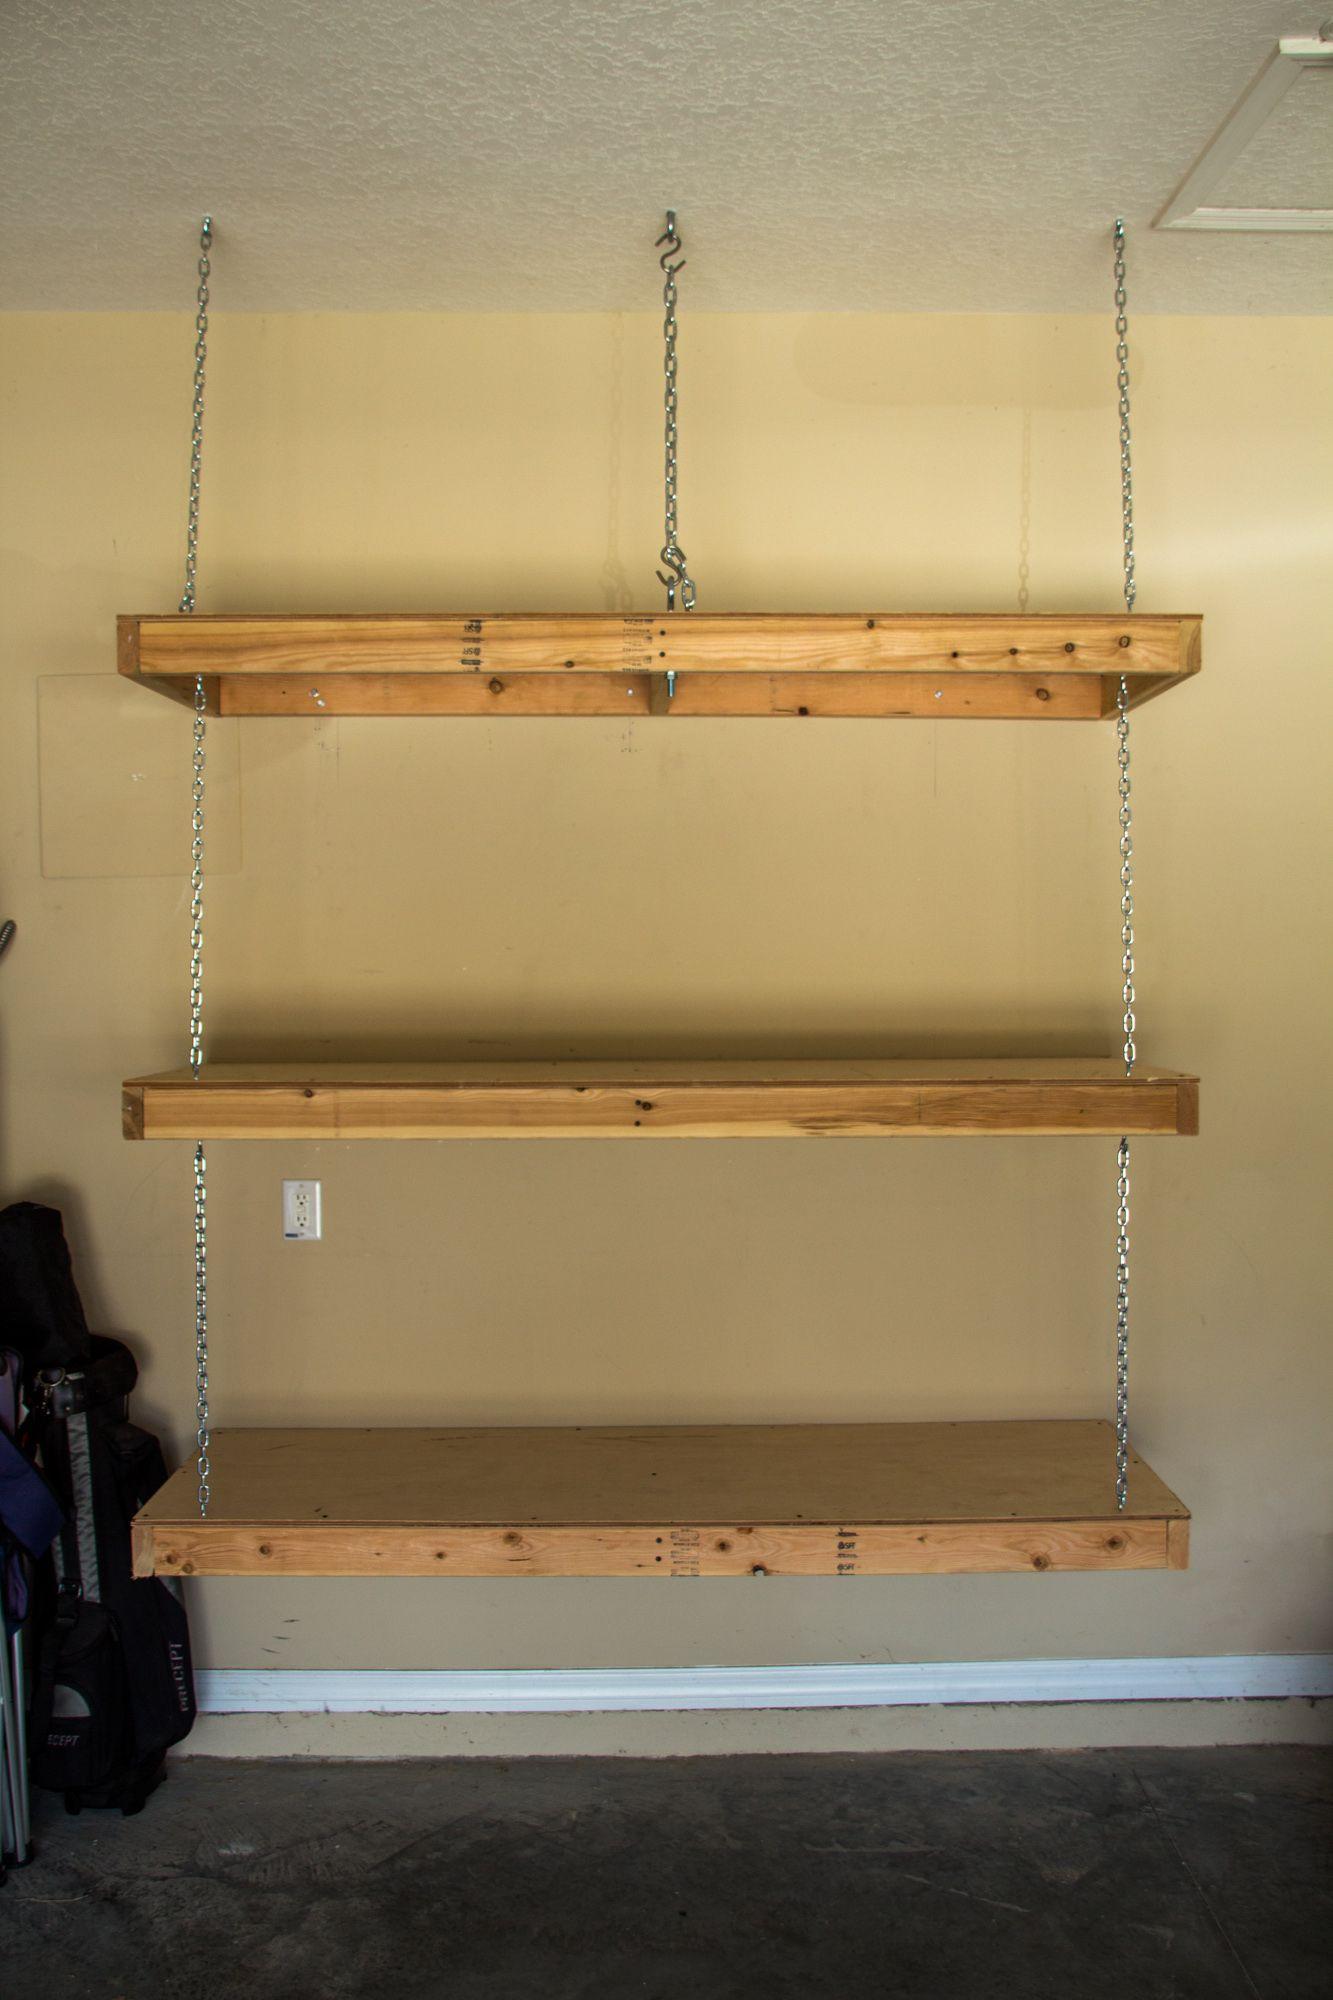 Hanging Garage Shelves Eye Bolt In Ceiling Goes Through Ceiling